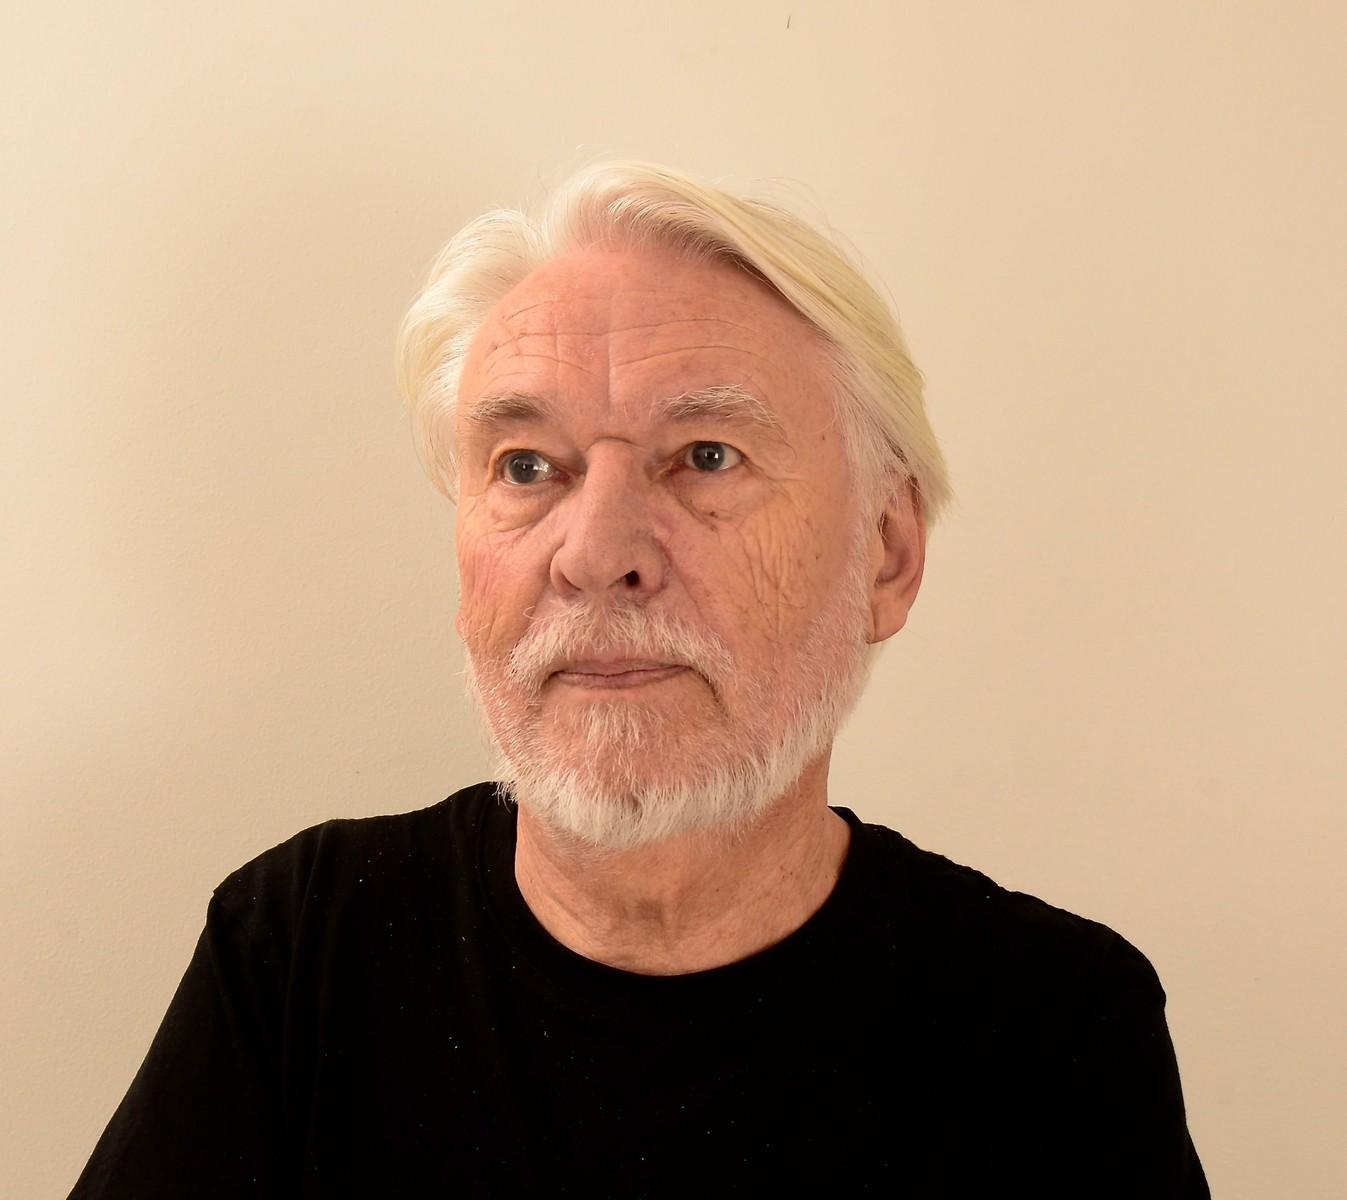 Roger Van Ouytsel